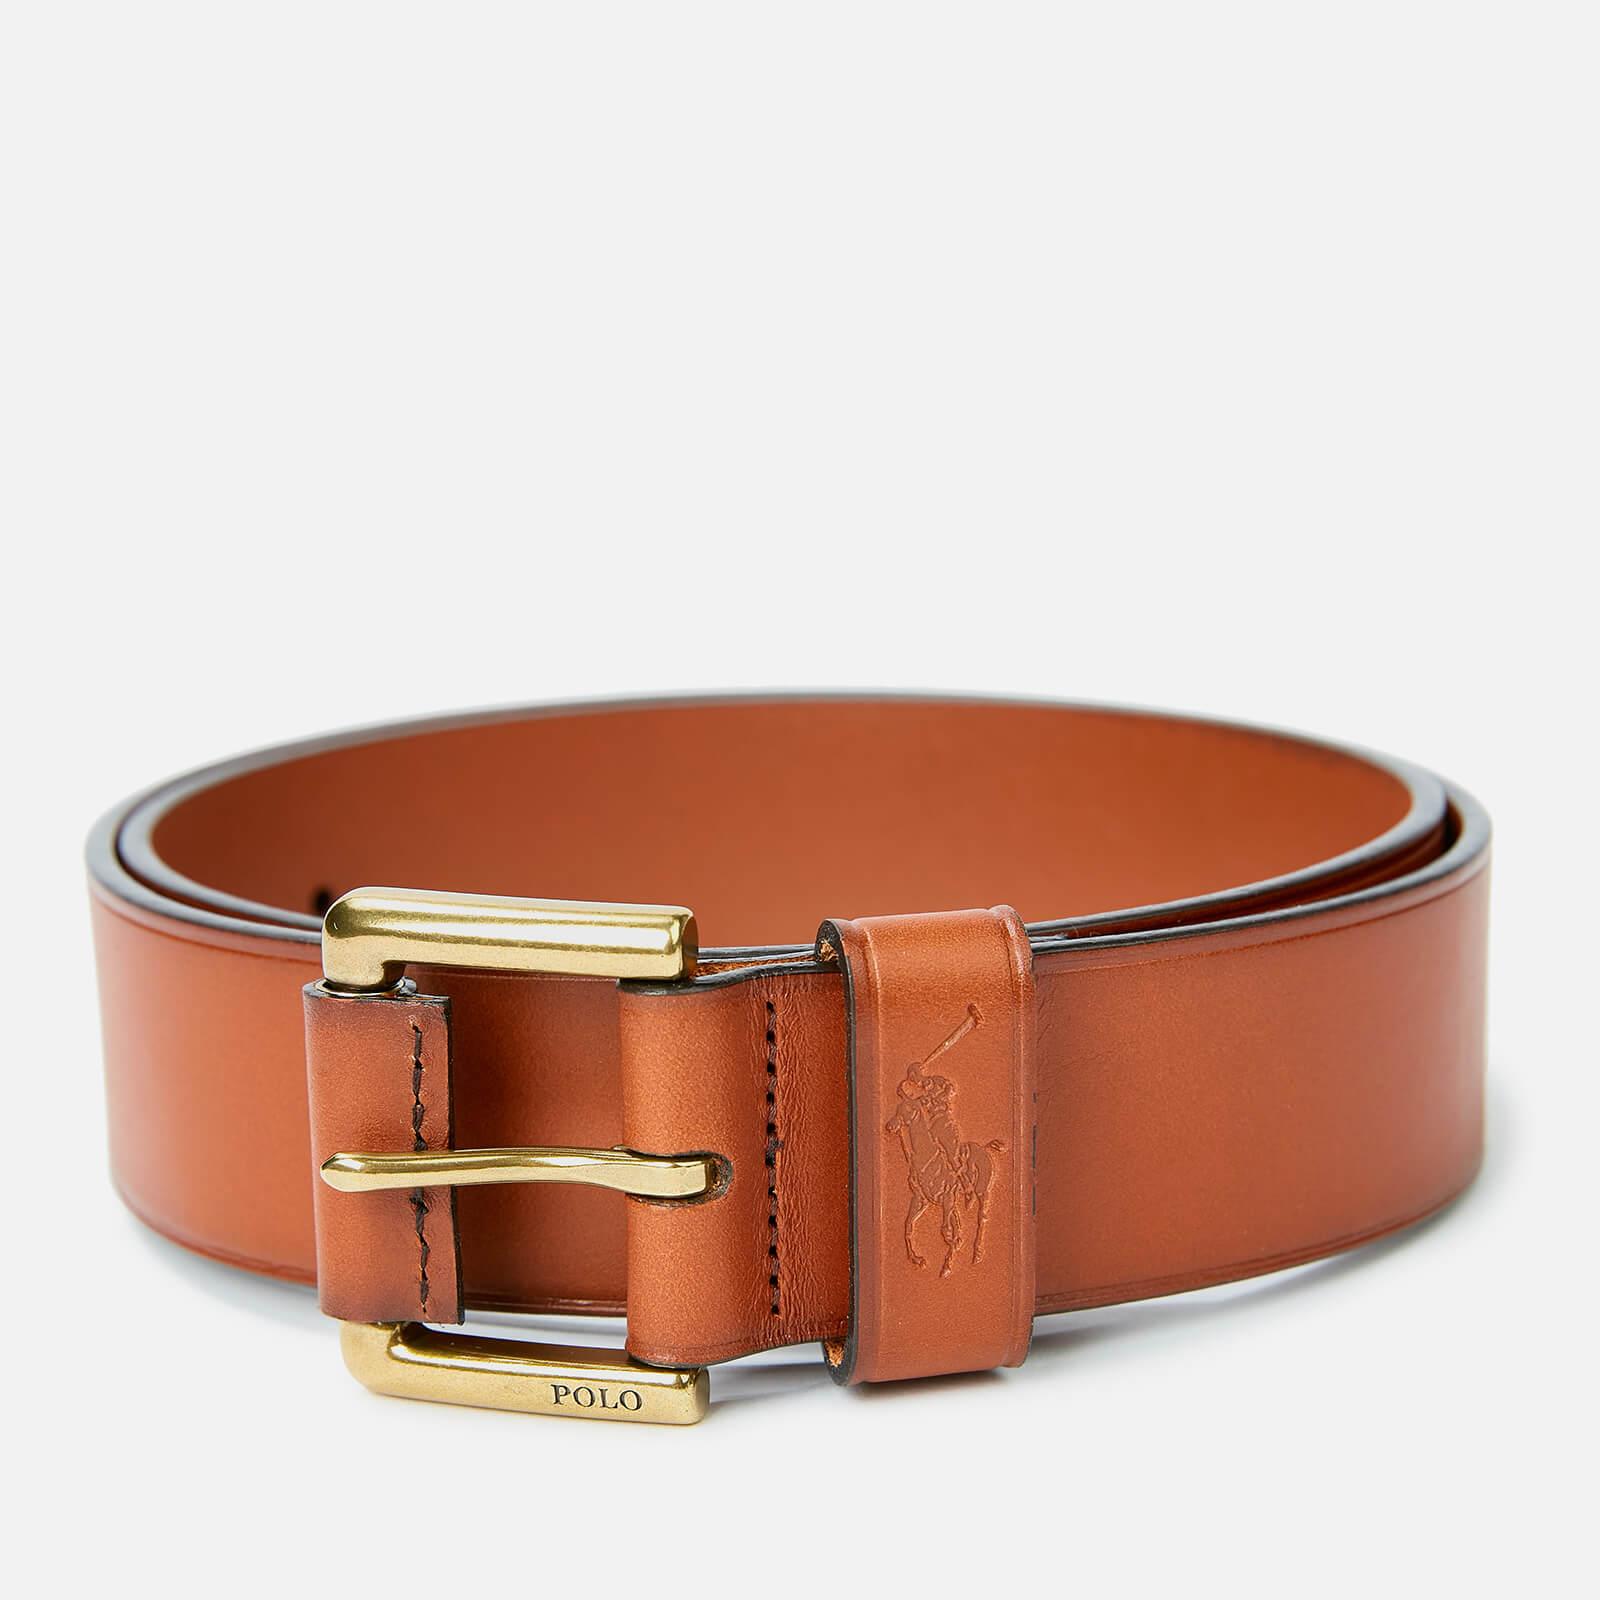 Polo Ralph Lauren Men's Leather Polo Dress Belt - Tan - Xl/W38